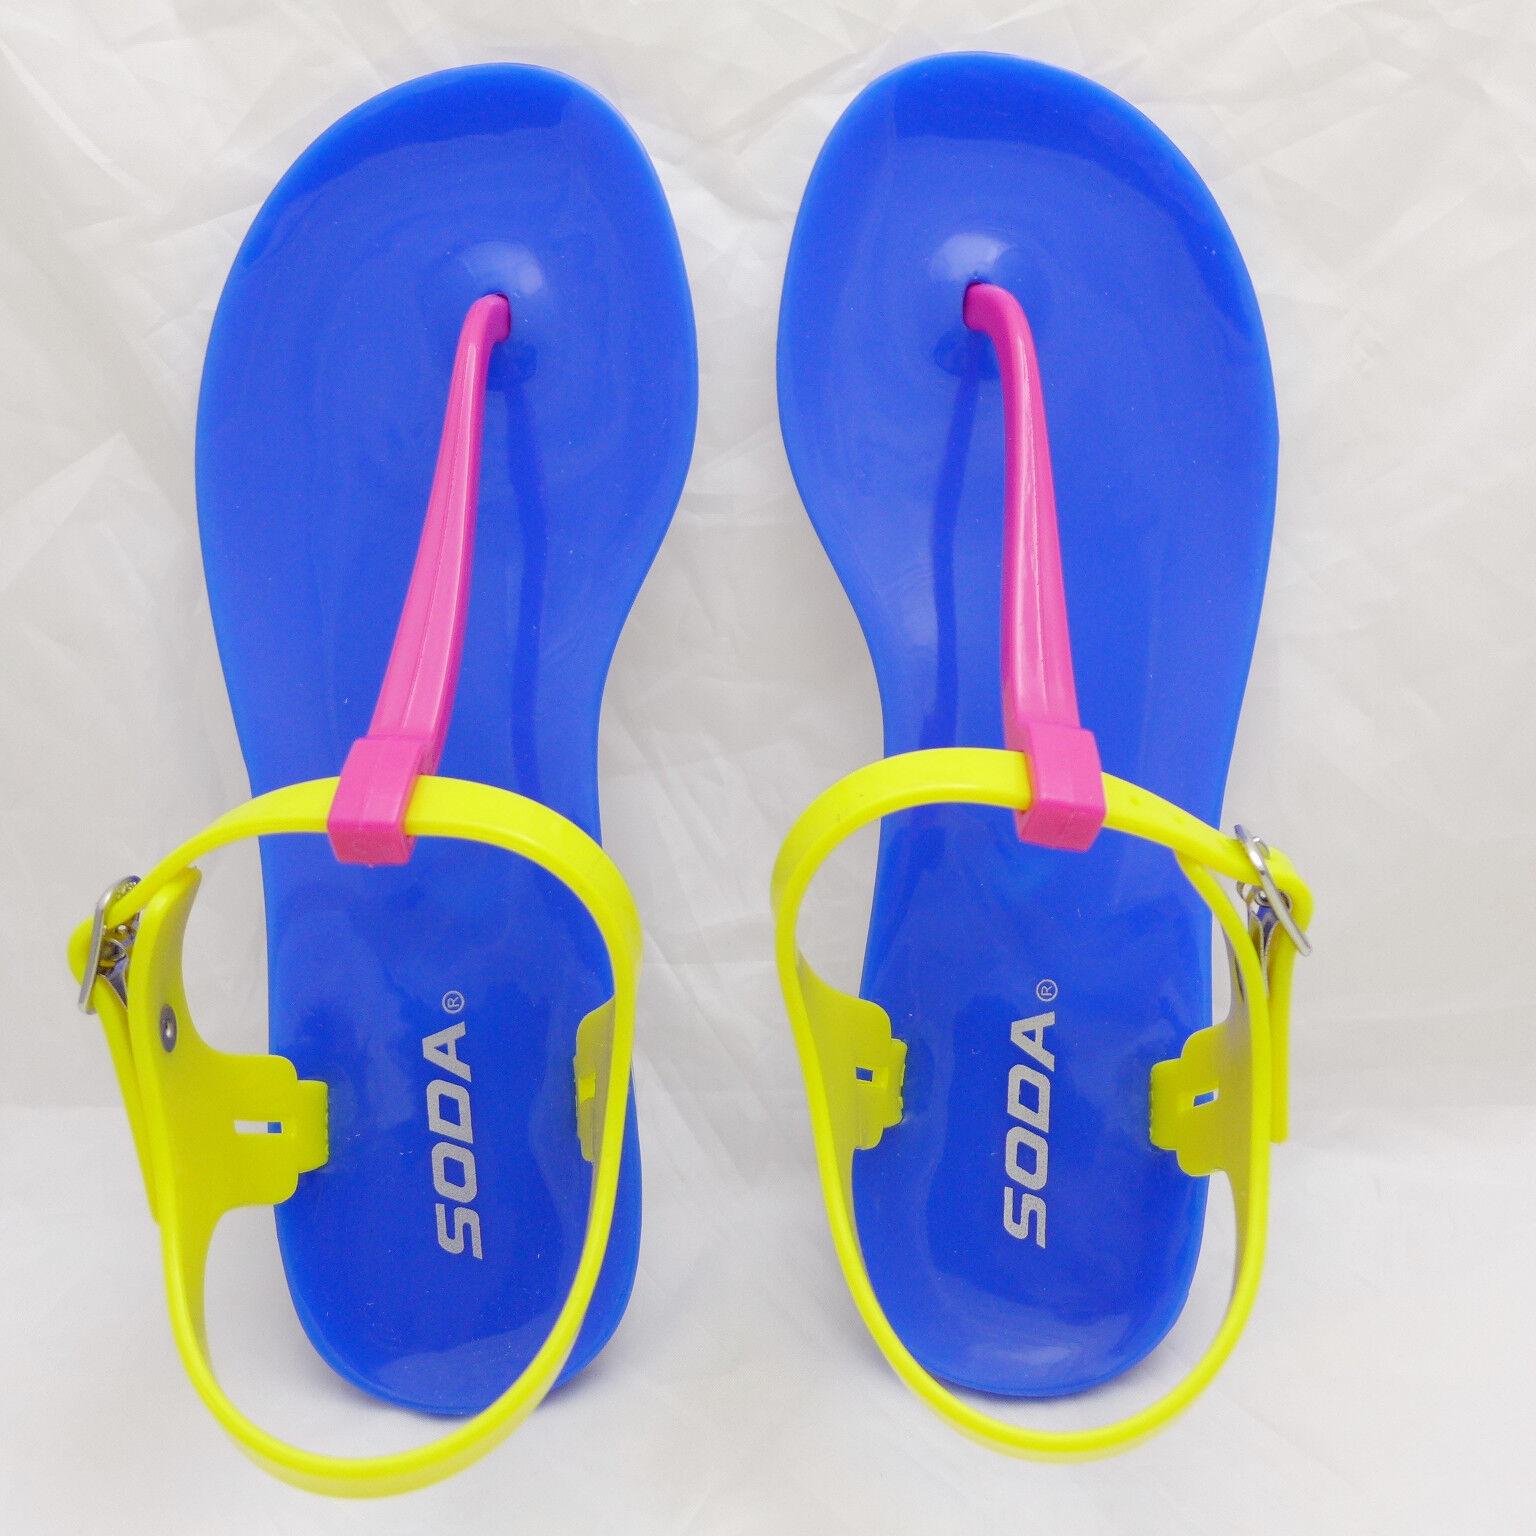 Womens Adjustable Strap PVC Thongs Sandals Flat Shoes 6 SODA IAN-S FU/YE Size 6 Shoes a46ea1